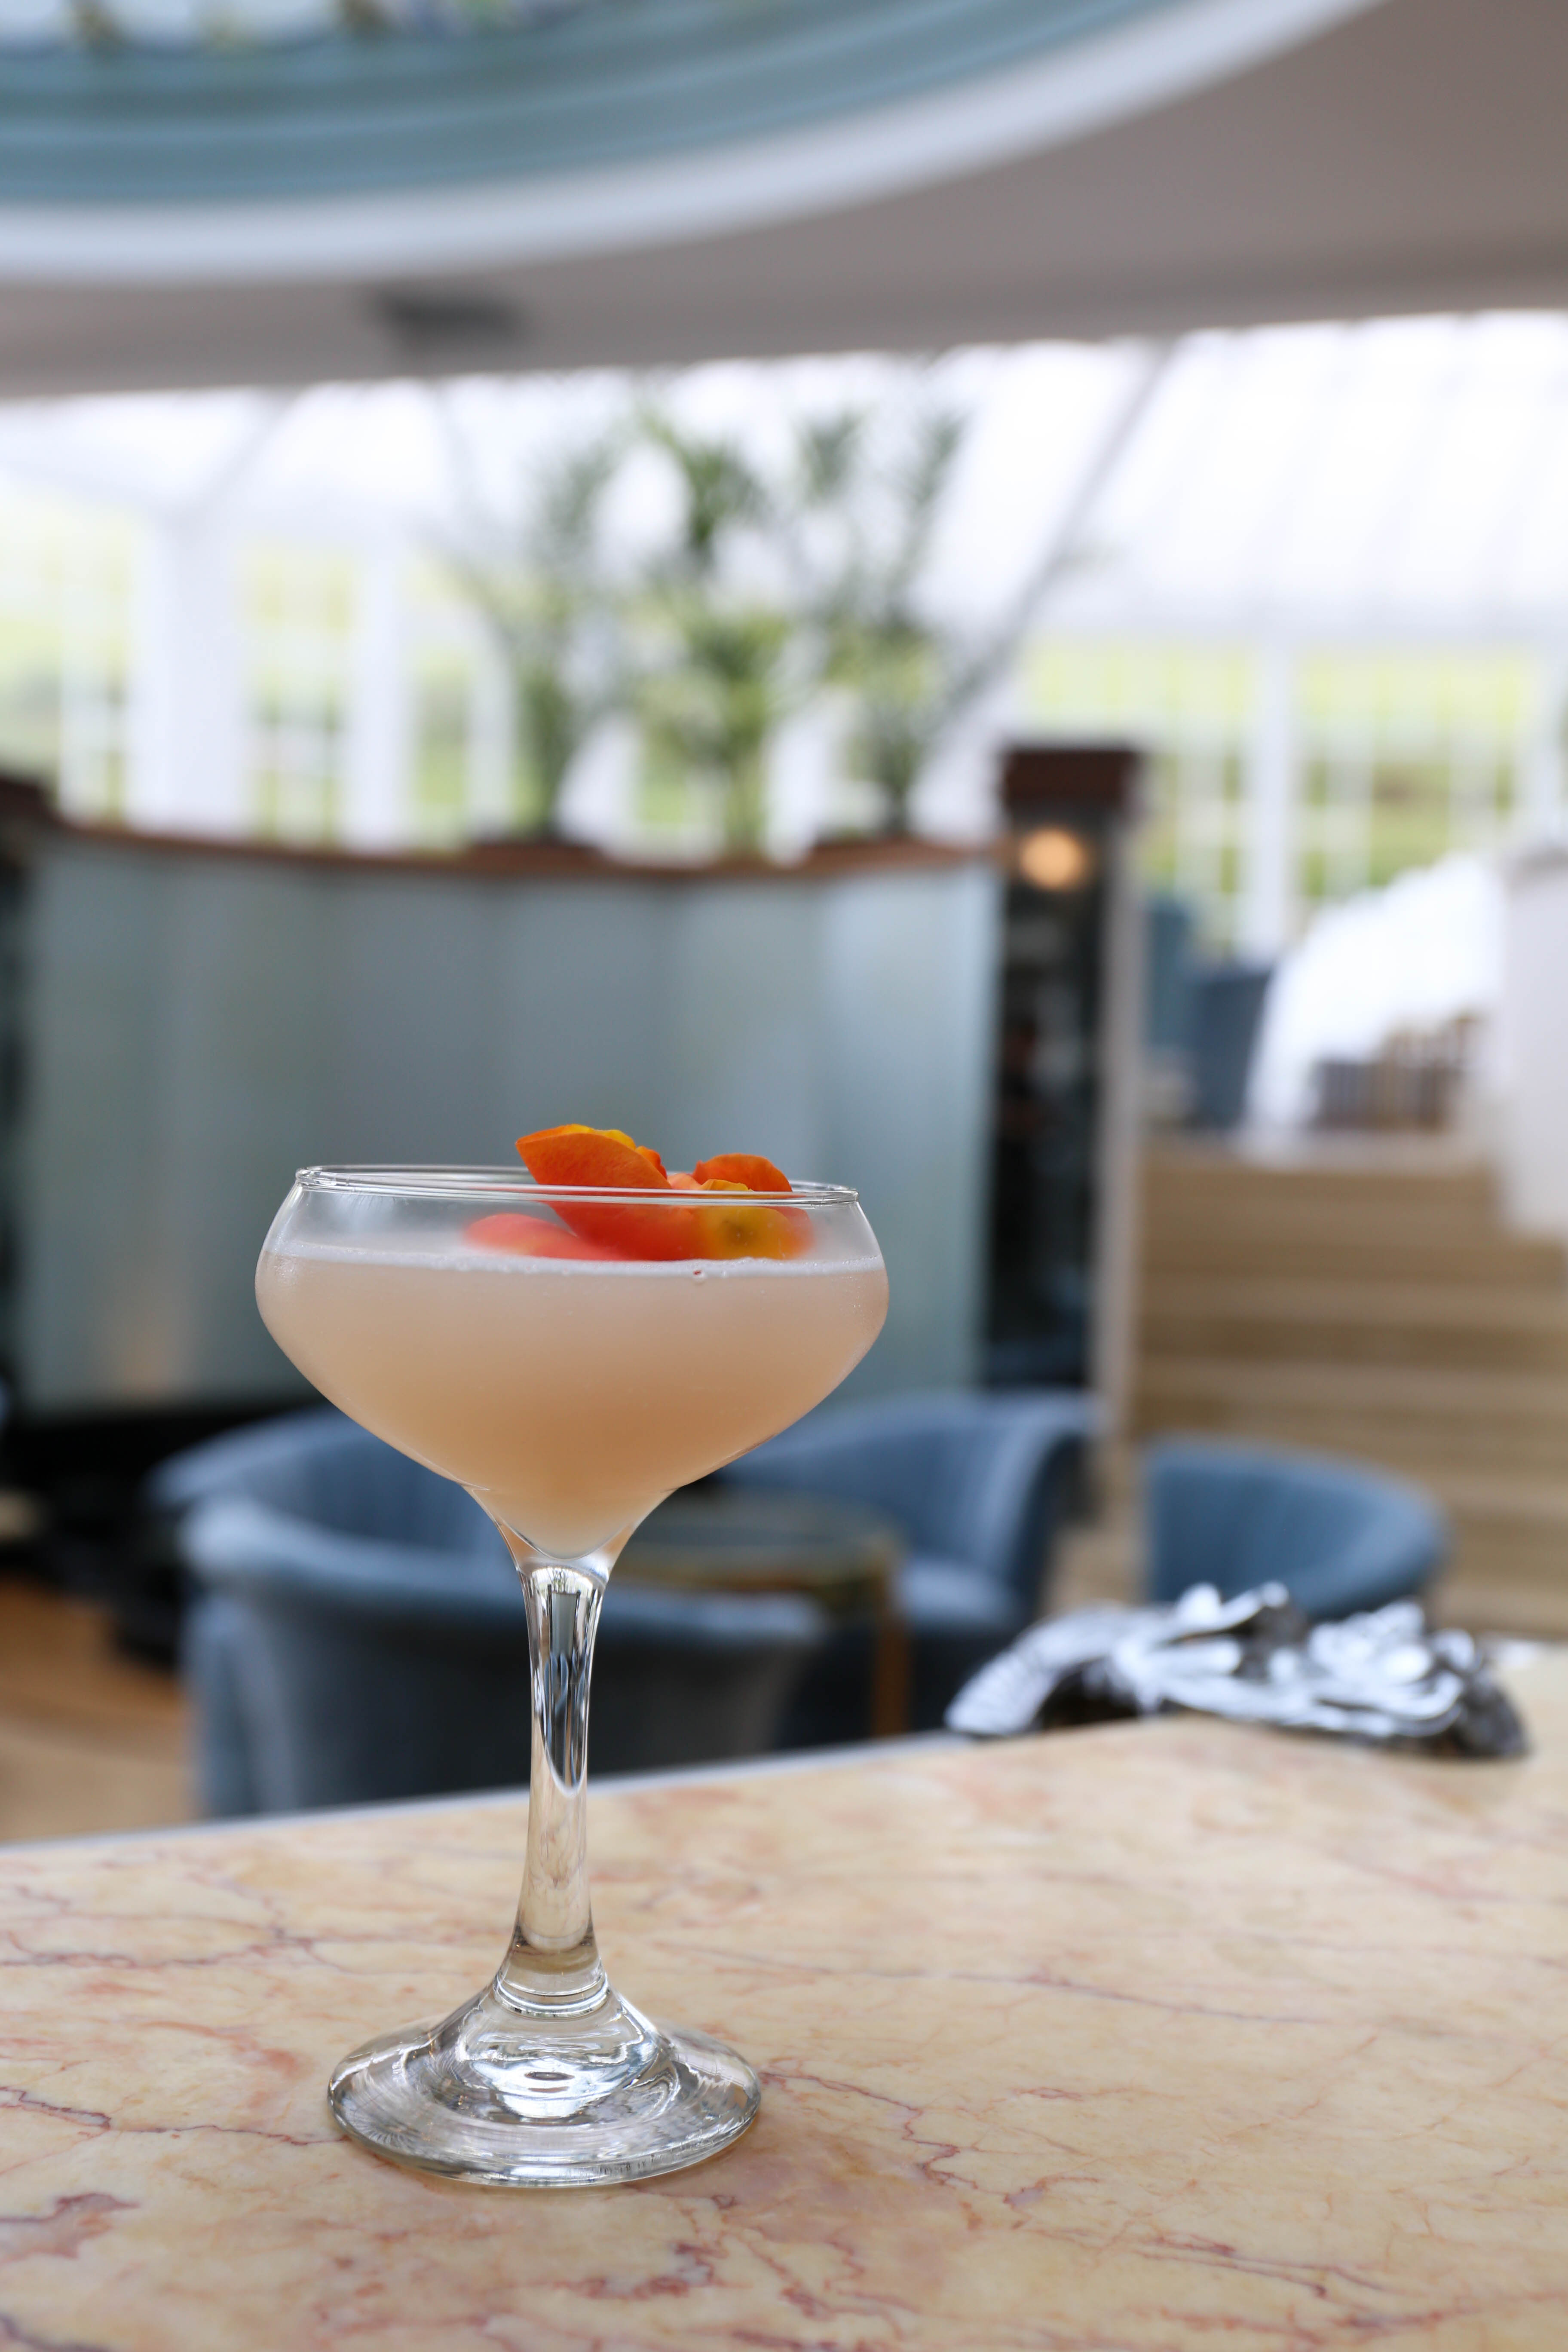 Lychee Blush Cove Vodka Cocktail at Burgh Island